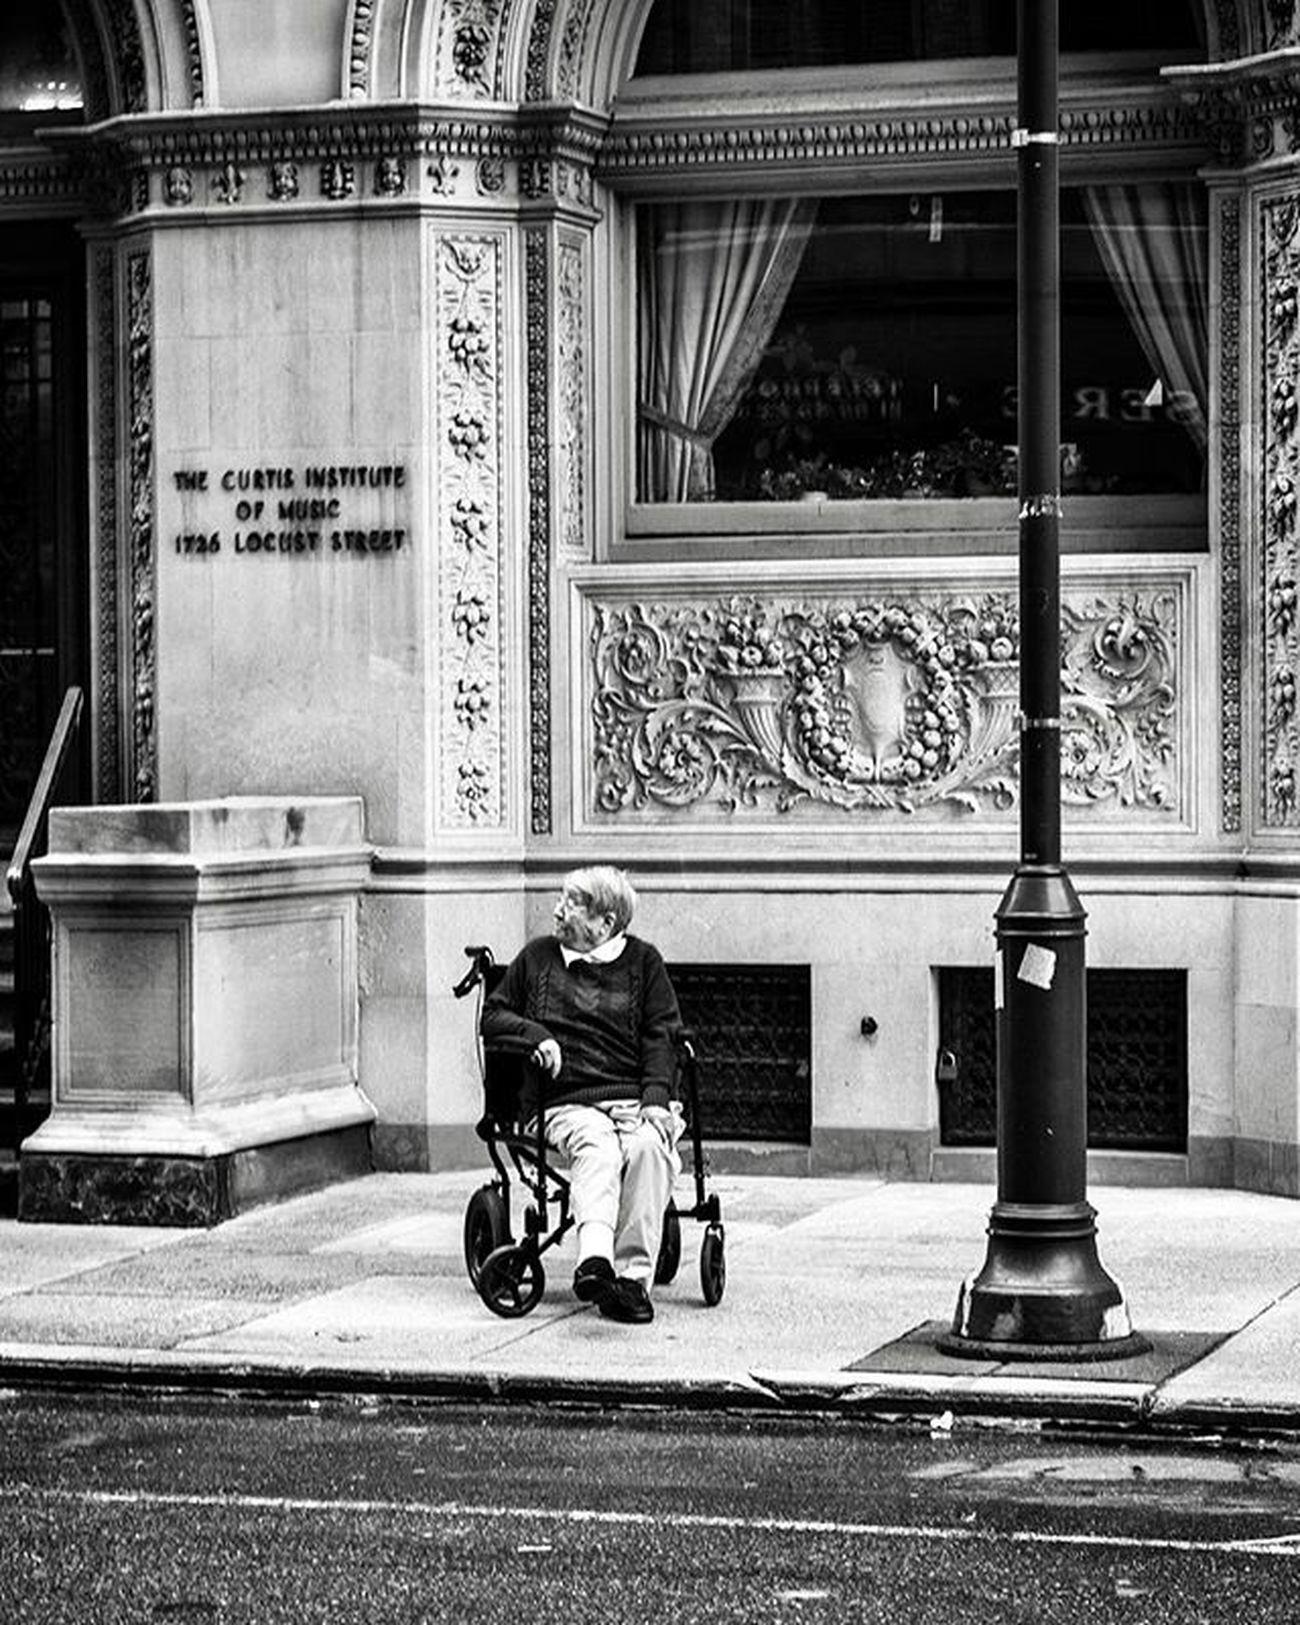 Left Behind Street Streetphotography Streetdreamsmag Philadelphia Philly Igers_philly Igers_philly_street Savephilly Citylife Citystreets Liphillyfe Howphillyseesphilly Blackandwhite Bnw_igers Bnw_society Bnw_planet Bnw_magazine Bnw_city Bnw Bw Rustlord Rustlord_bnw Rustlord_street Rsa_bnw Rsa_streetview ig_contrastbnw ig_photooftheday lenkagrid iwalkedthisstreet